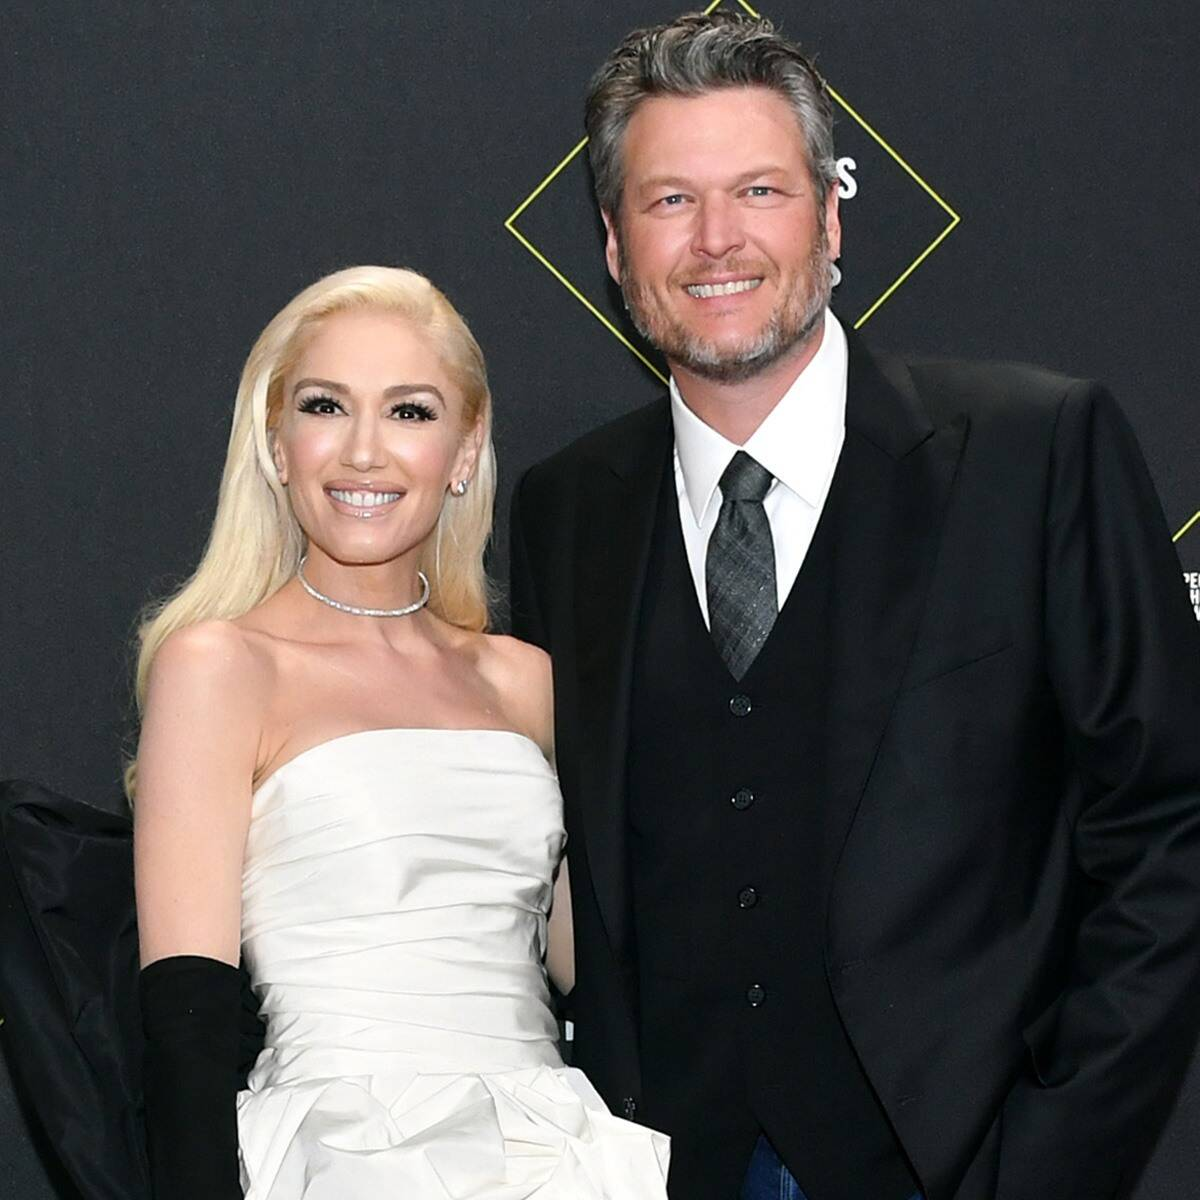 Blake Shelton Abandoned by Country Stars Nashville For Going Hollywood!